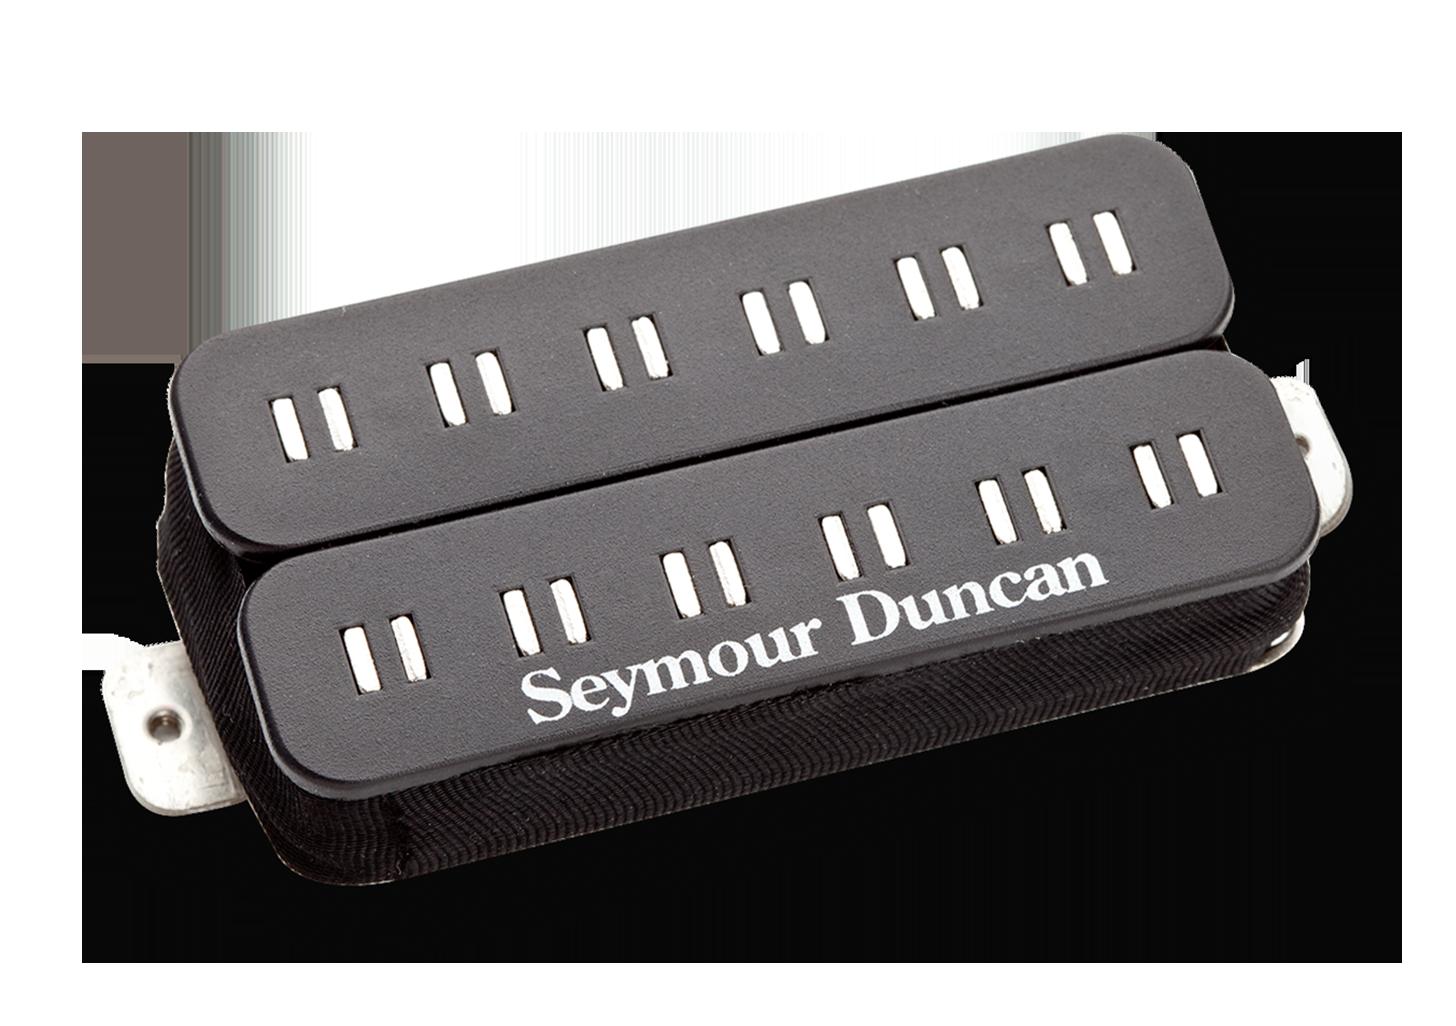 Seymour Duncan Parallel Axis Original Humbucker - PA-TB1B Bridge